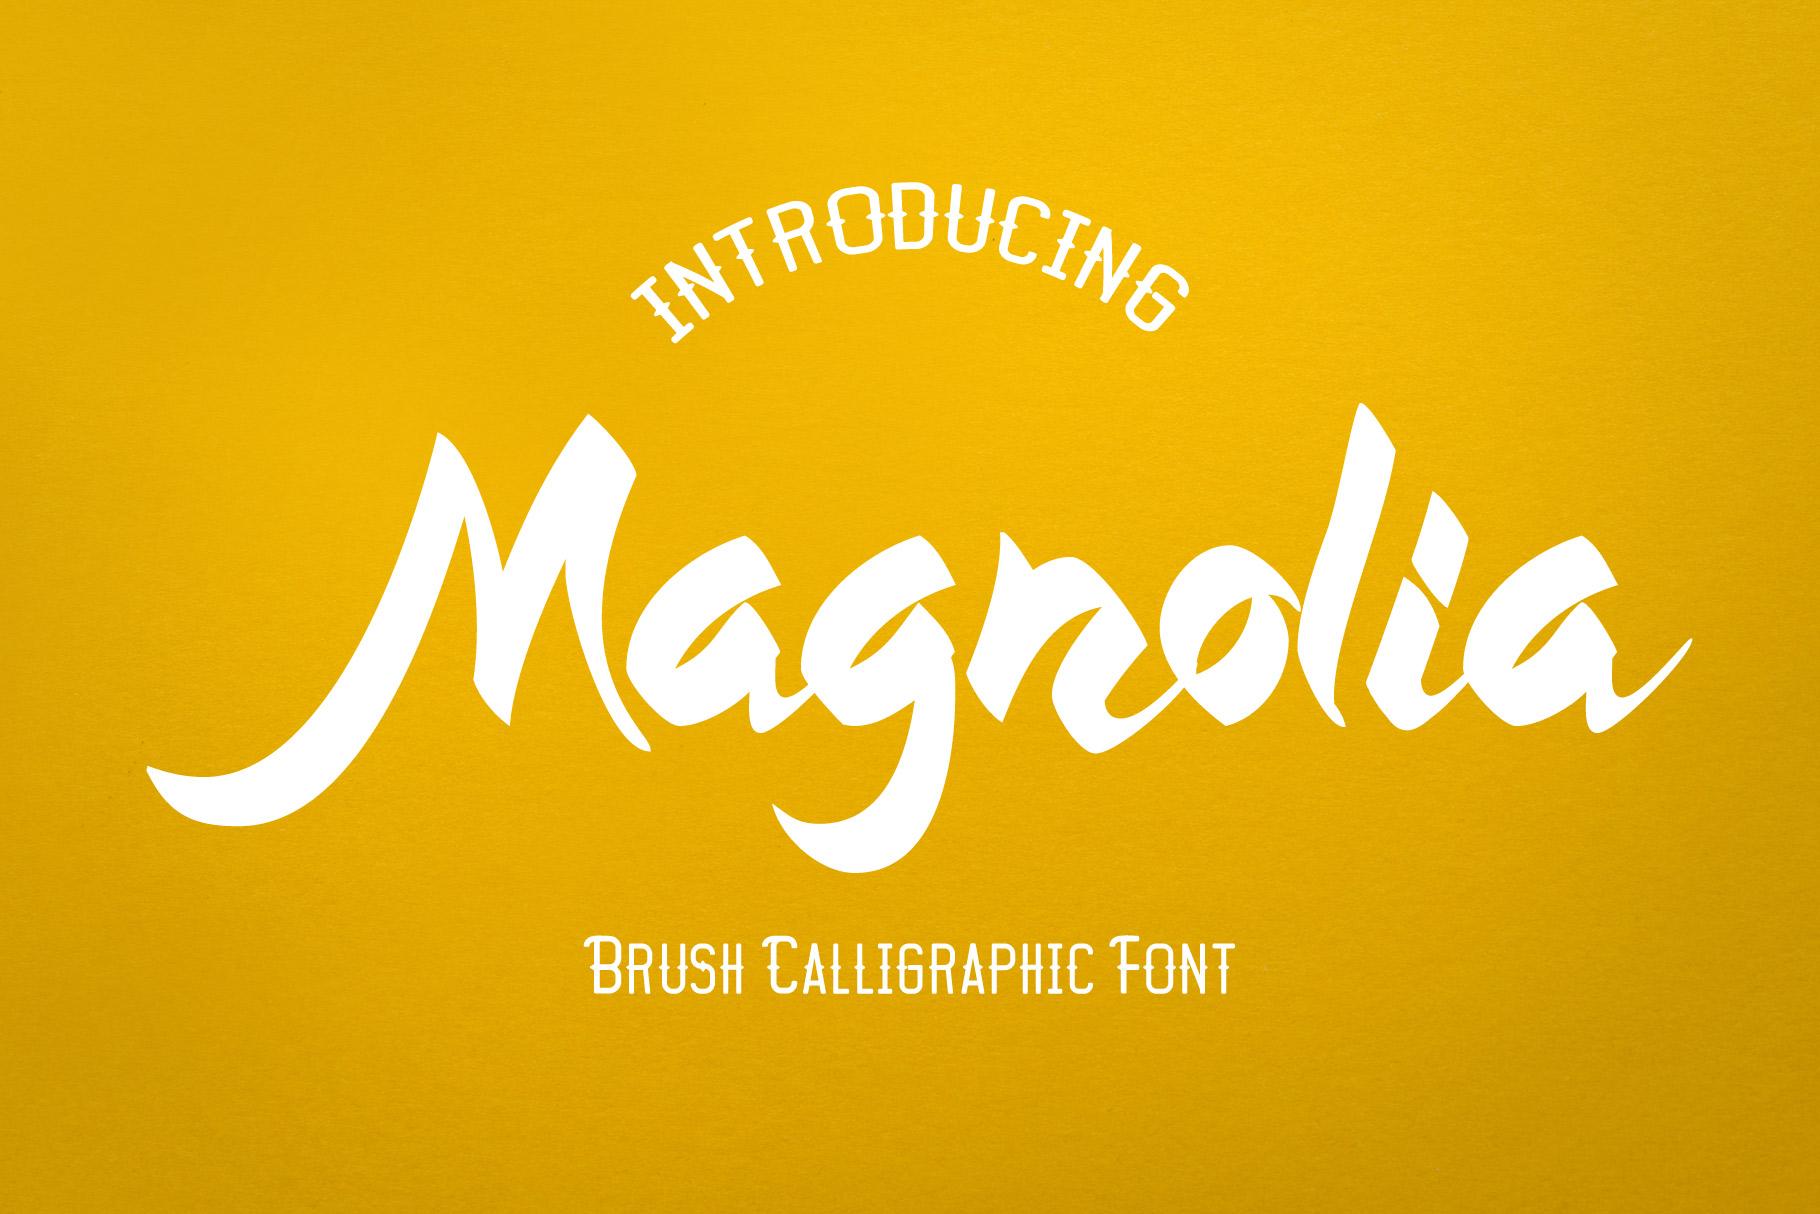 Magnolia - Callygraphic Font example image 1